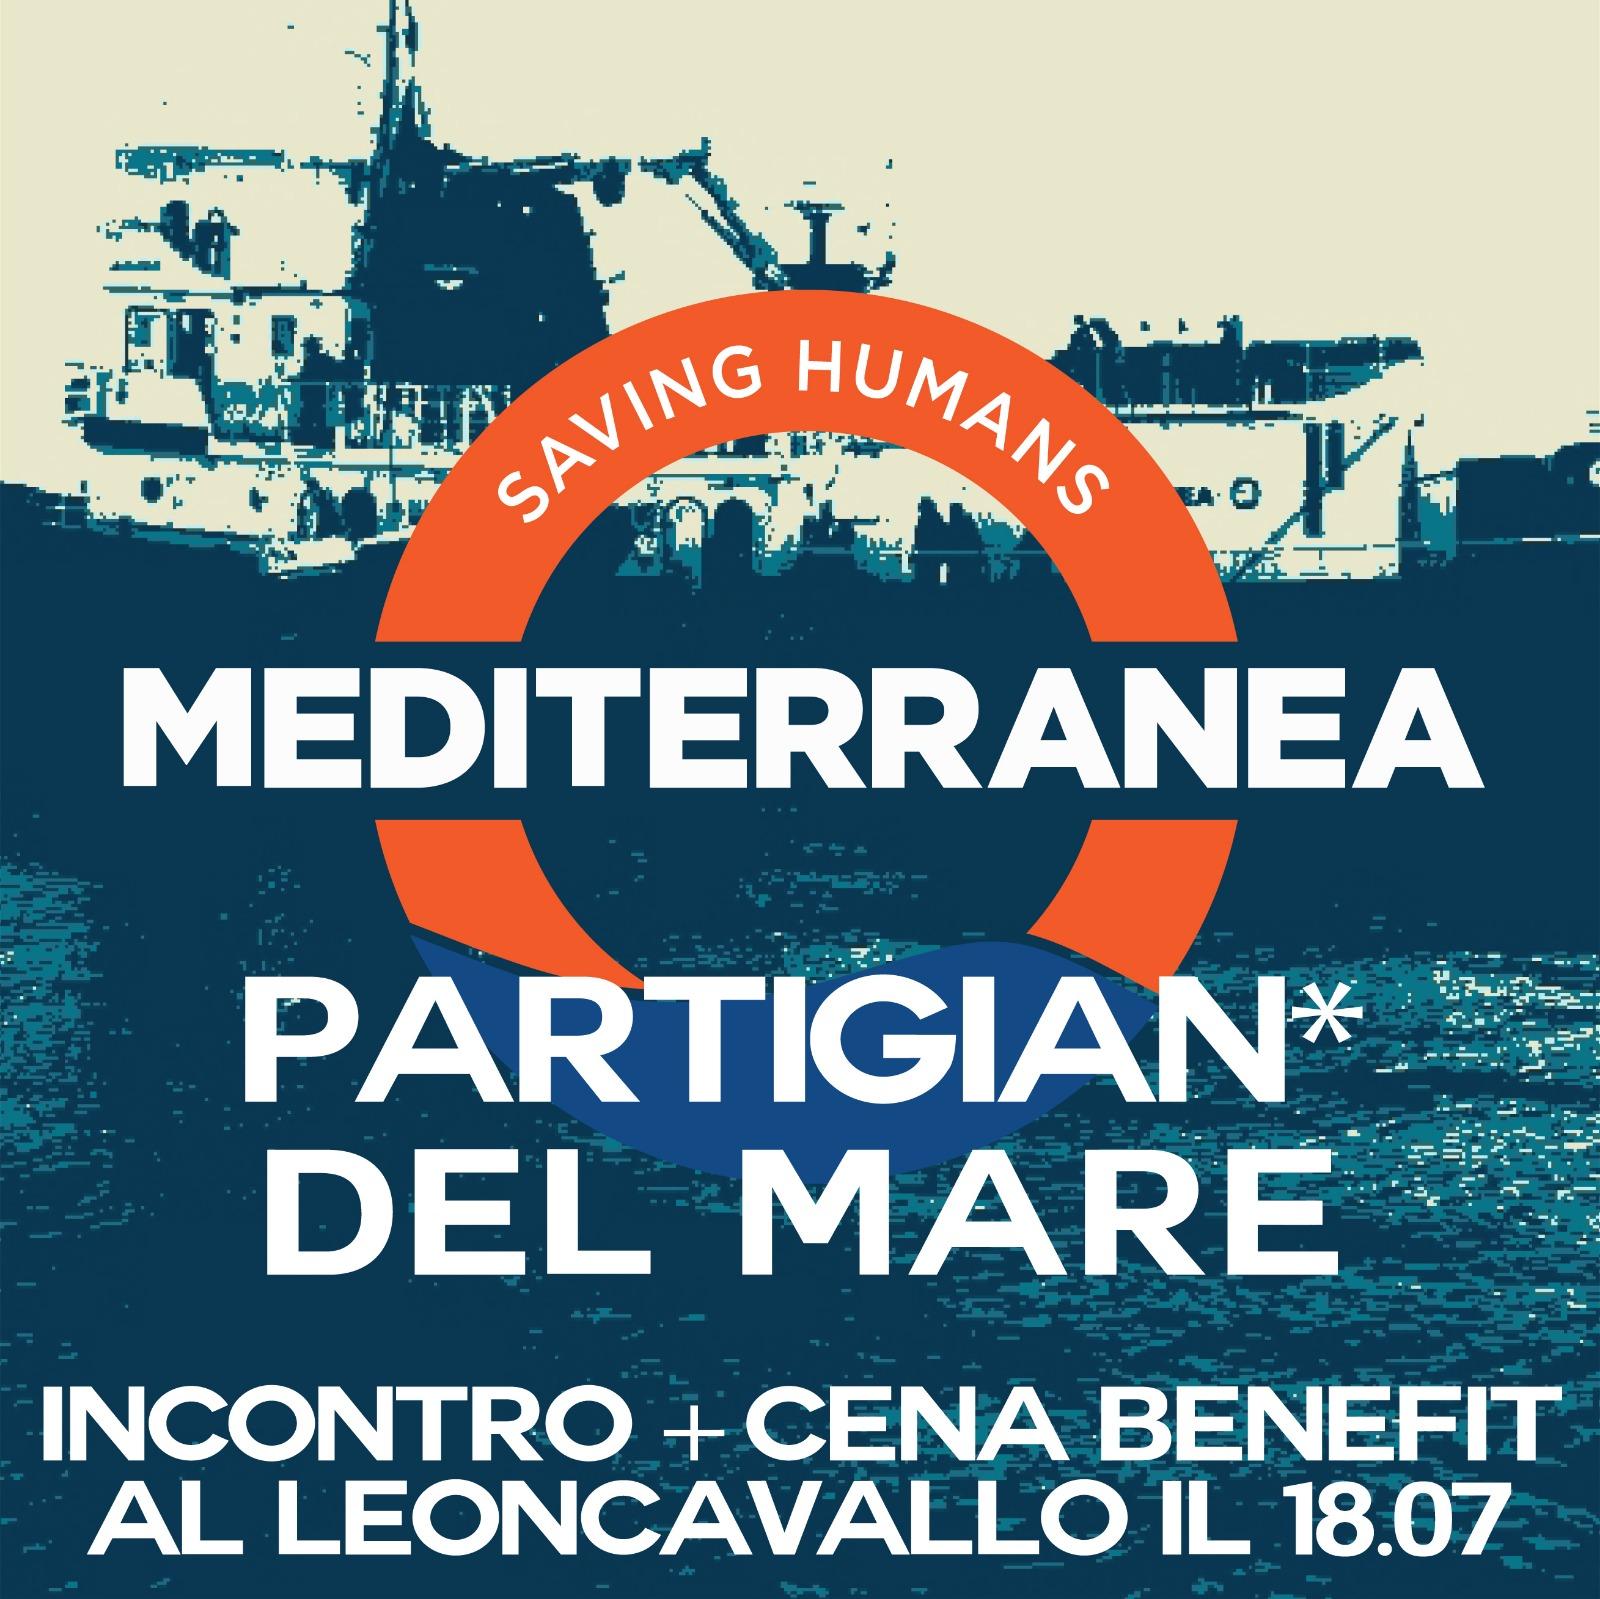 Mediterranea: incontro + cena benefit